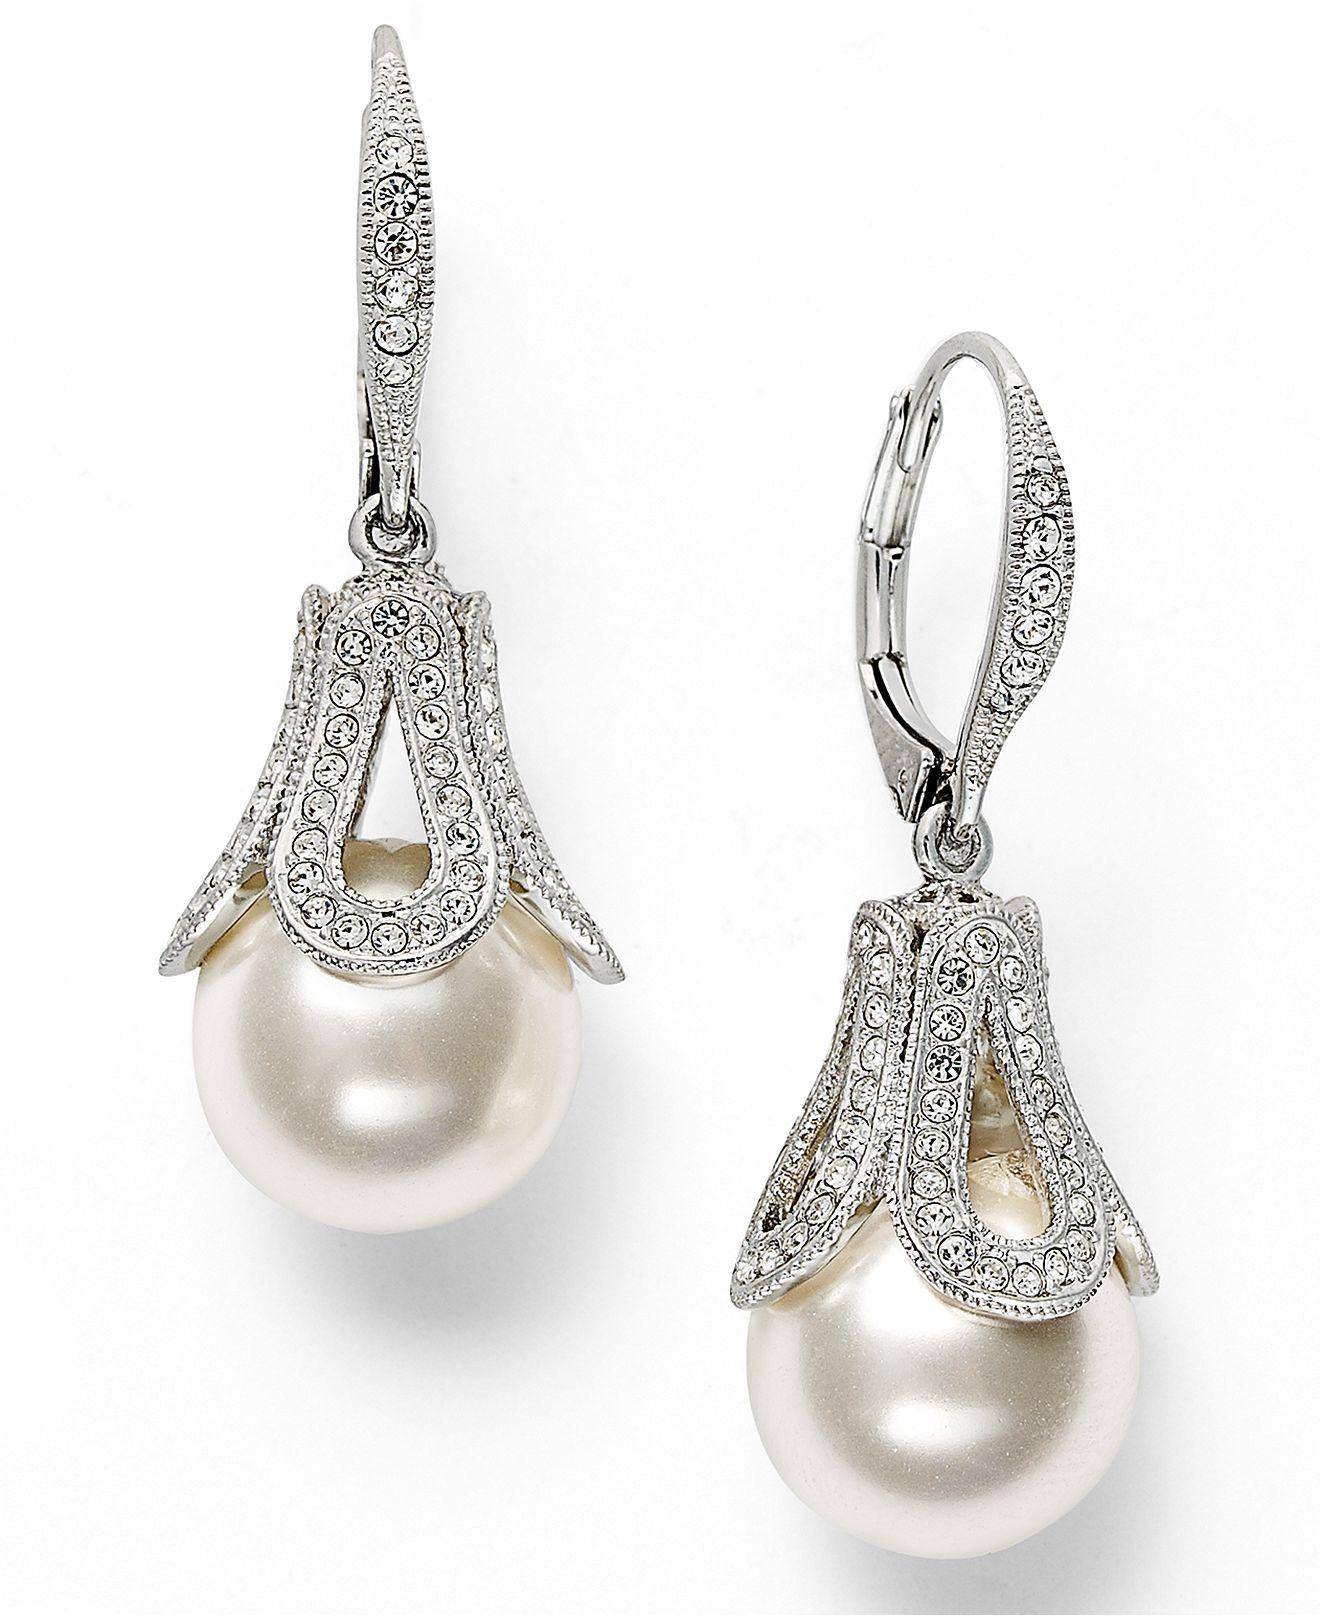 Eliot Danori Earrings, Silvertone Simulated Pearl And Crystal Teardrop  Earrings   Macys